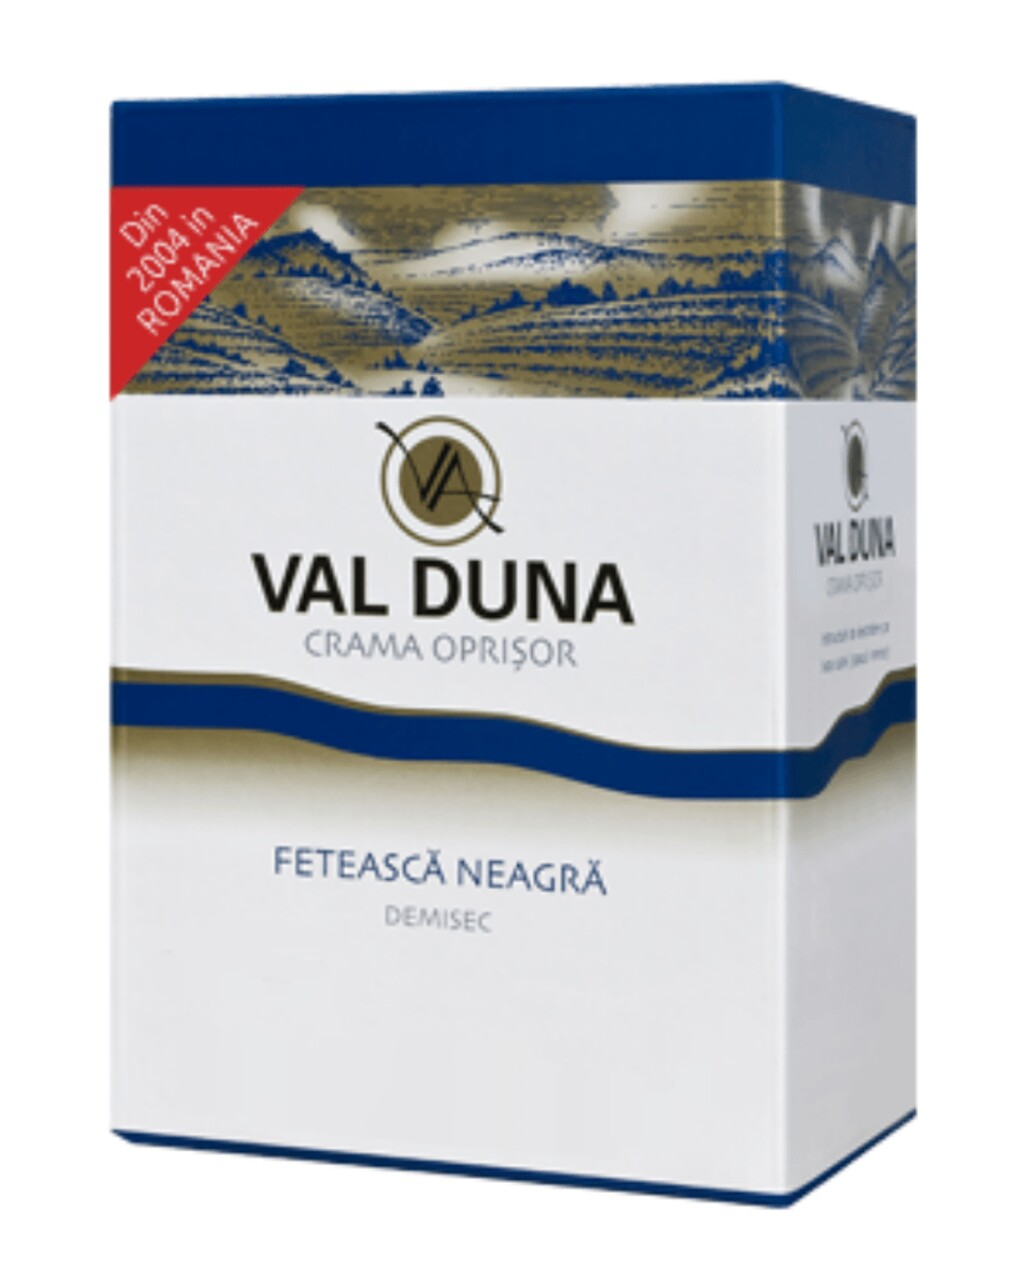 Oprisor Val Duna Feteasca Neagra BIB 3L